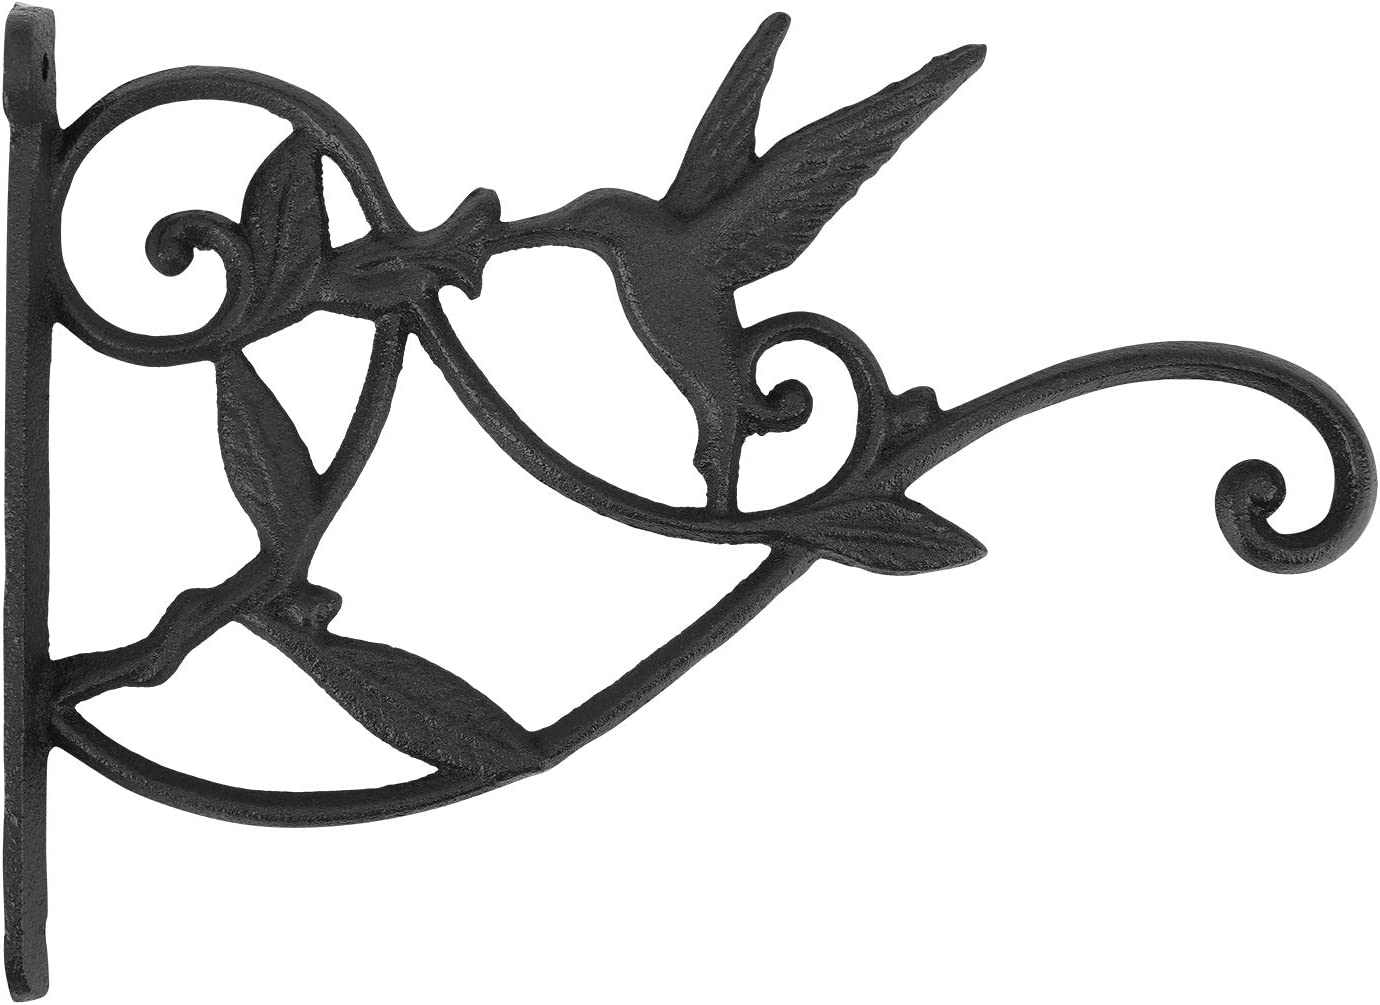 Lewondr Wall Hanging Plant Bracket, 10 Inch Retro Outdoor Indoor Garden Hook Décor Wrought Iron Decorative Plant Brackets with Screws for Balcony Bird Feeder Wind Chime Lantern, Humming Bird - Rust